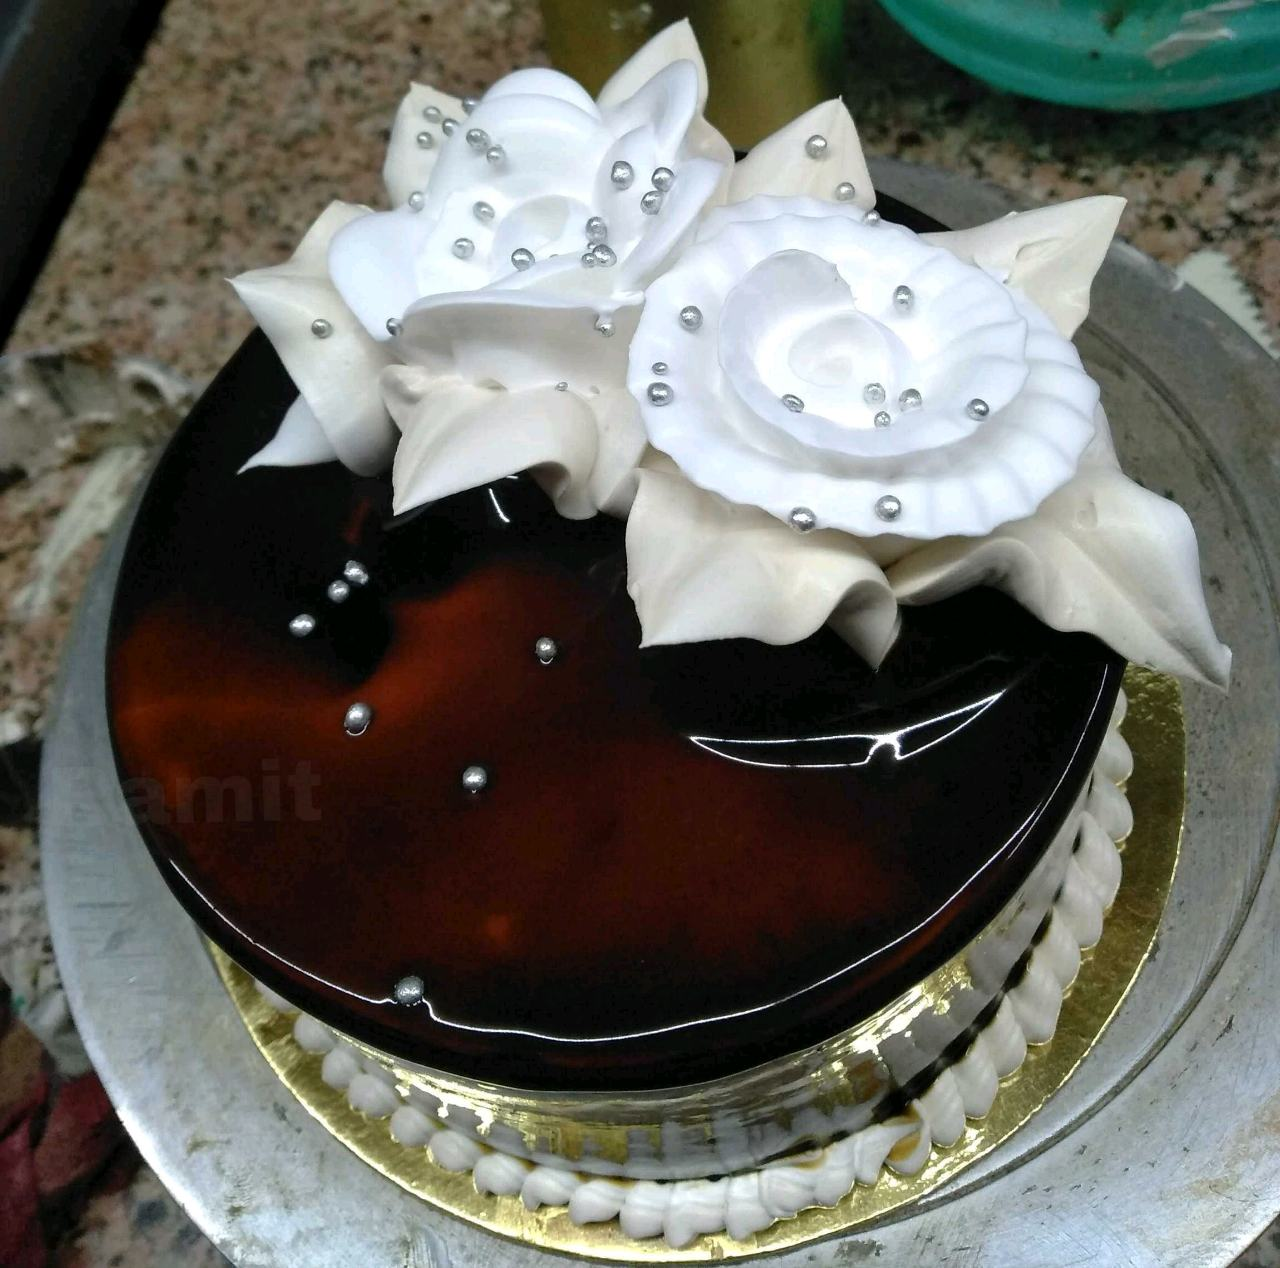 Eggless Chocolate glazed cake